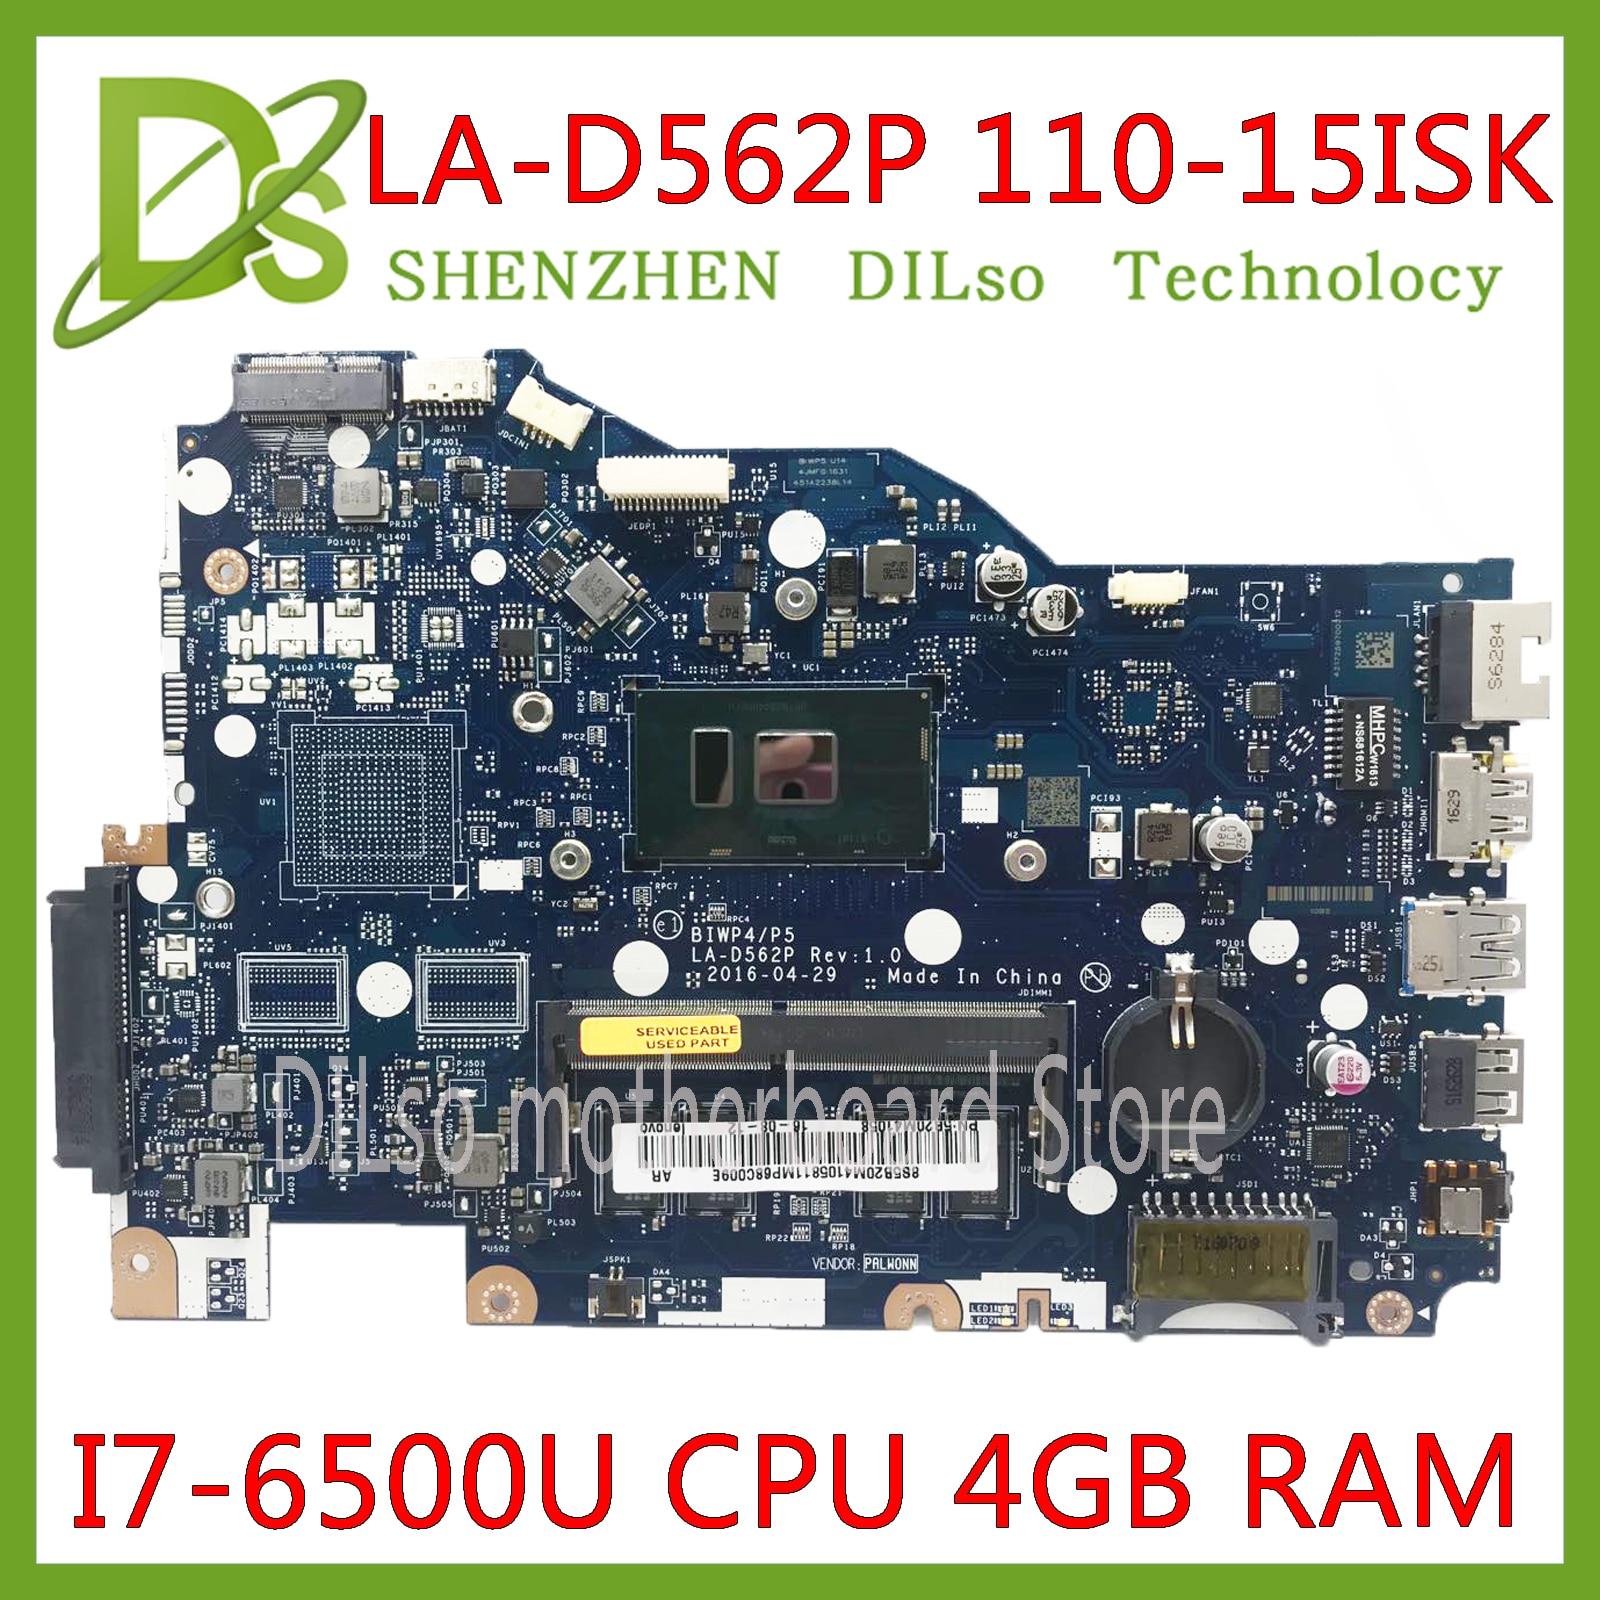 KEFU LA-D562P placa base para Lenovo 110-15isk placa base de computadora portátil LA-D562P I7-6500U CPU 4GB prueba trabajo 100% original